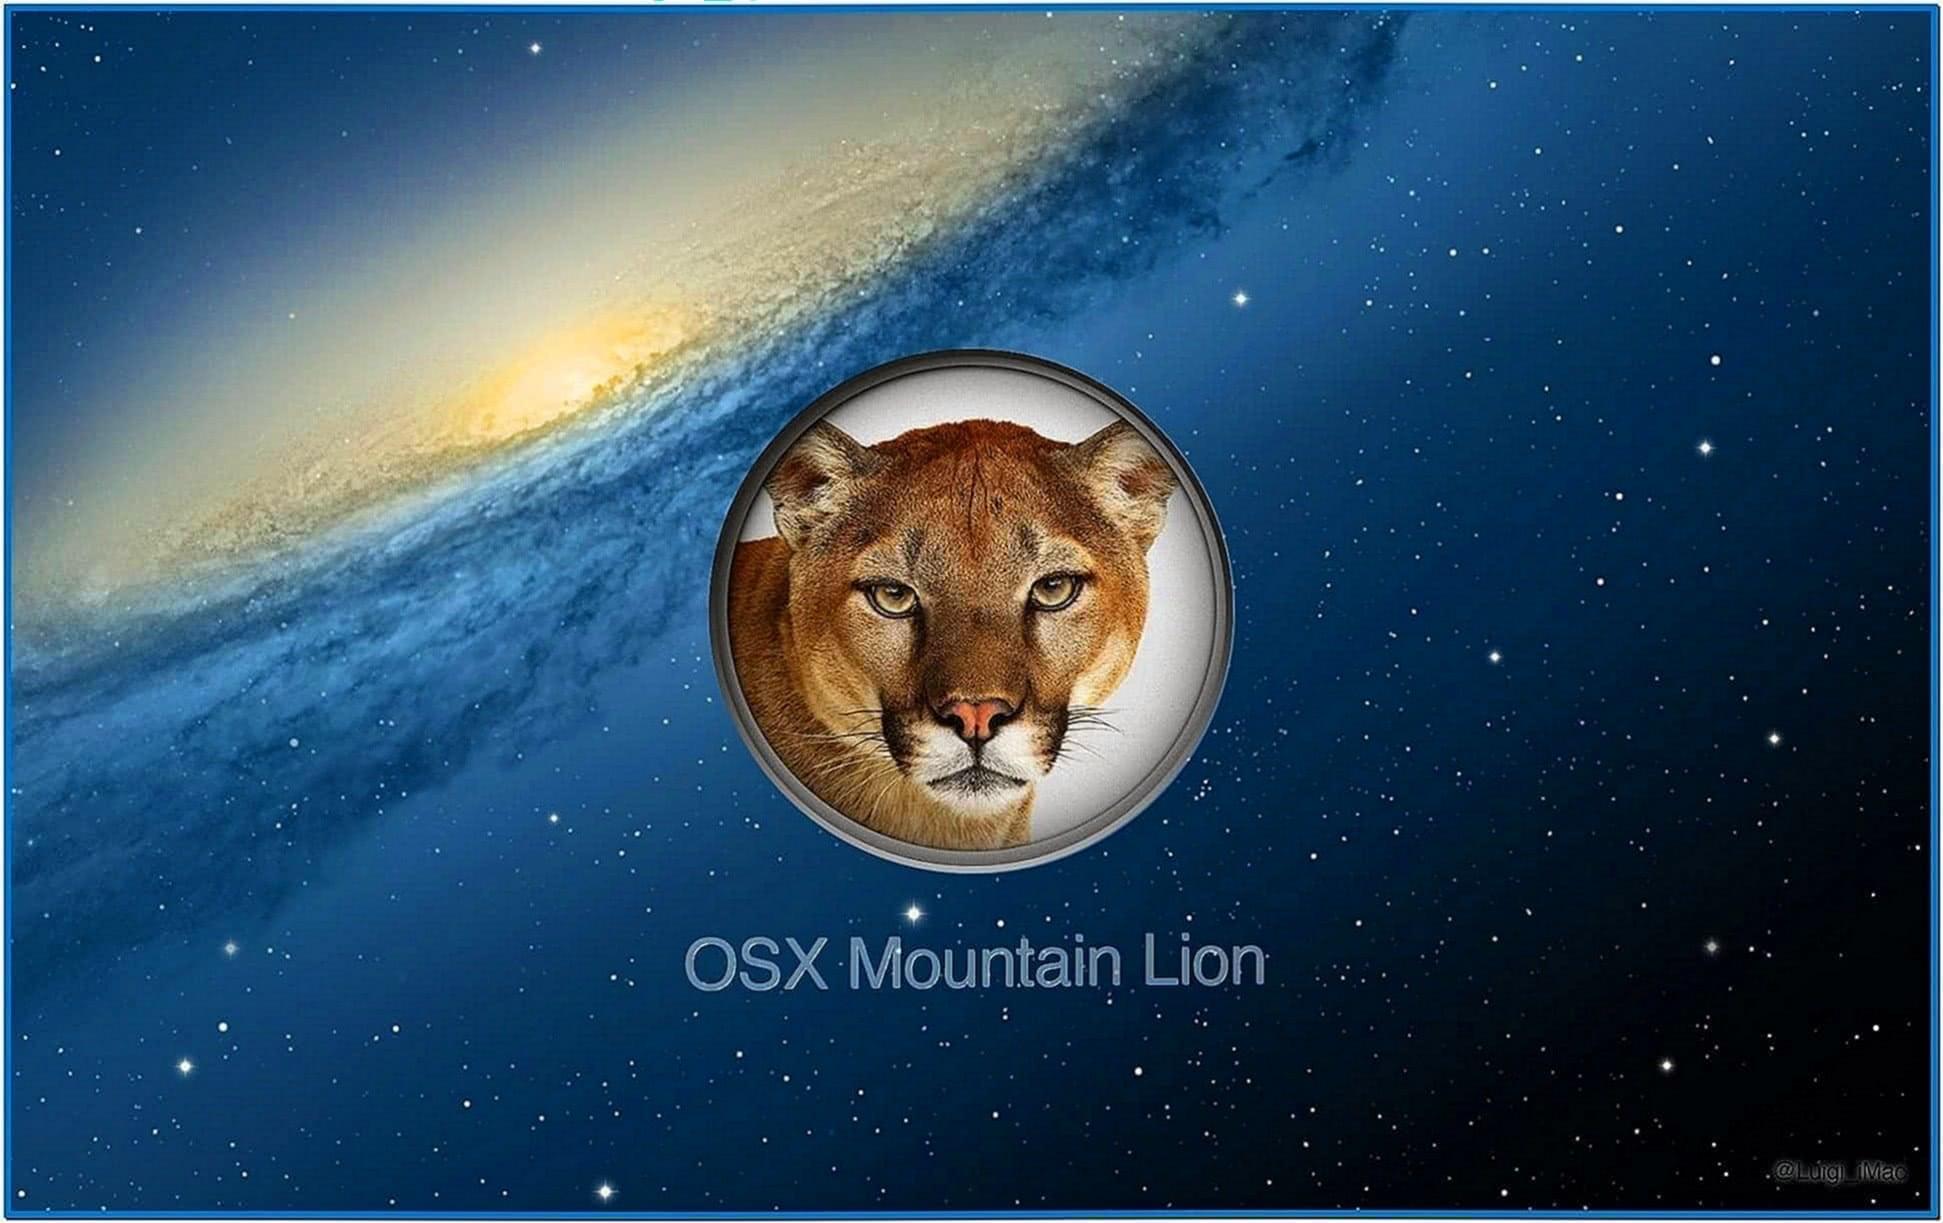 Screensaver Mac OS X 10.8